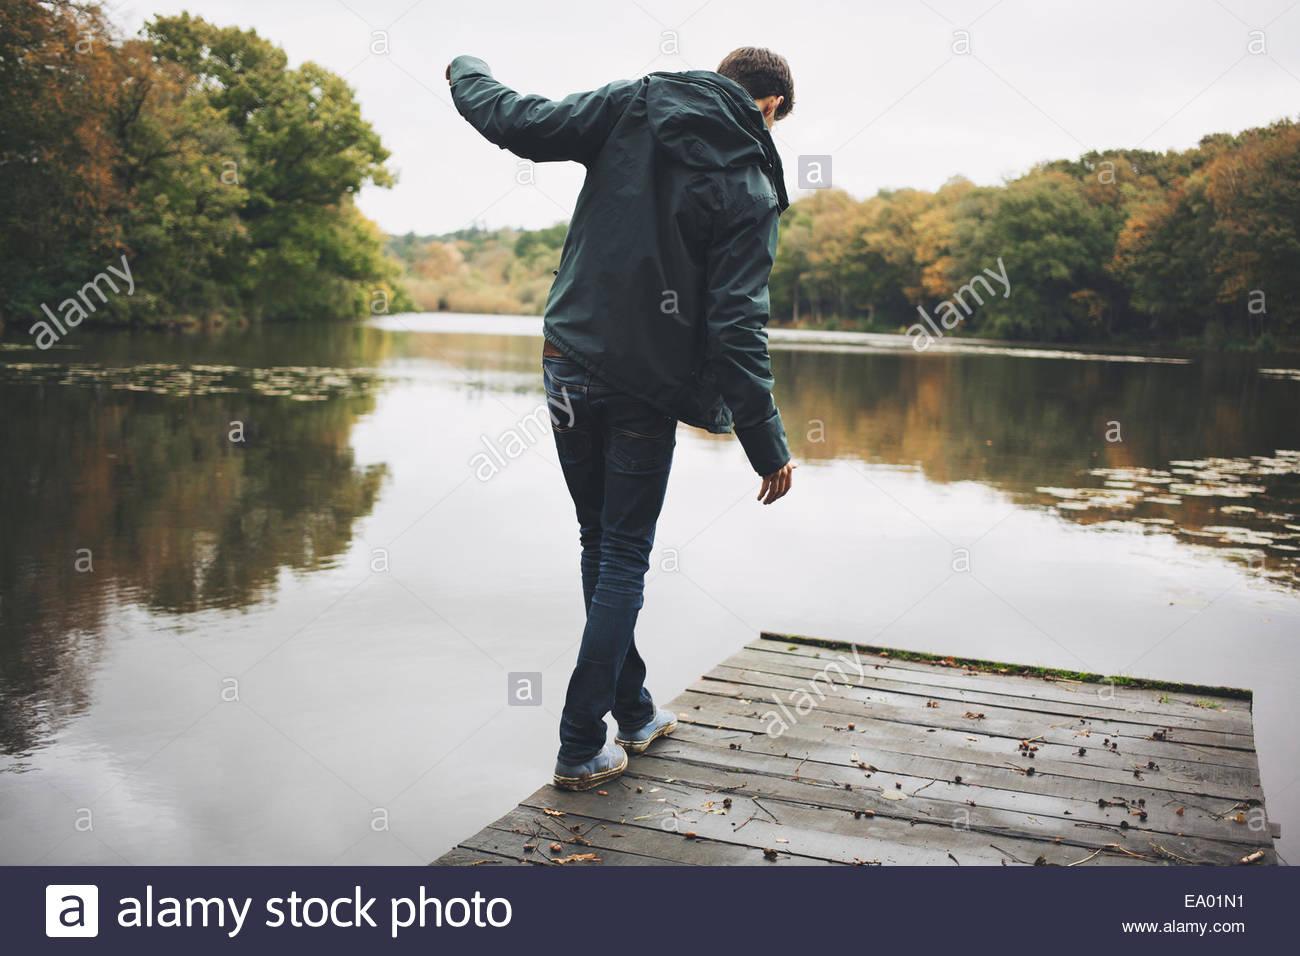 Young man walking along edge of river pier - Stock Image